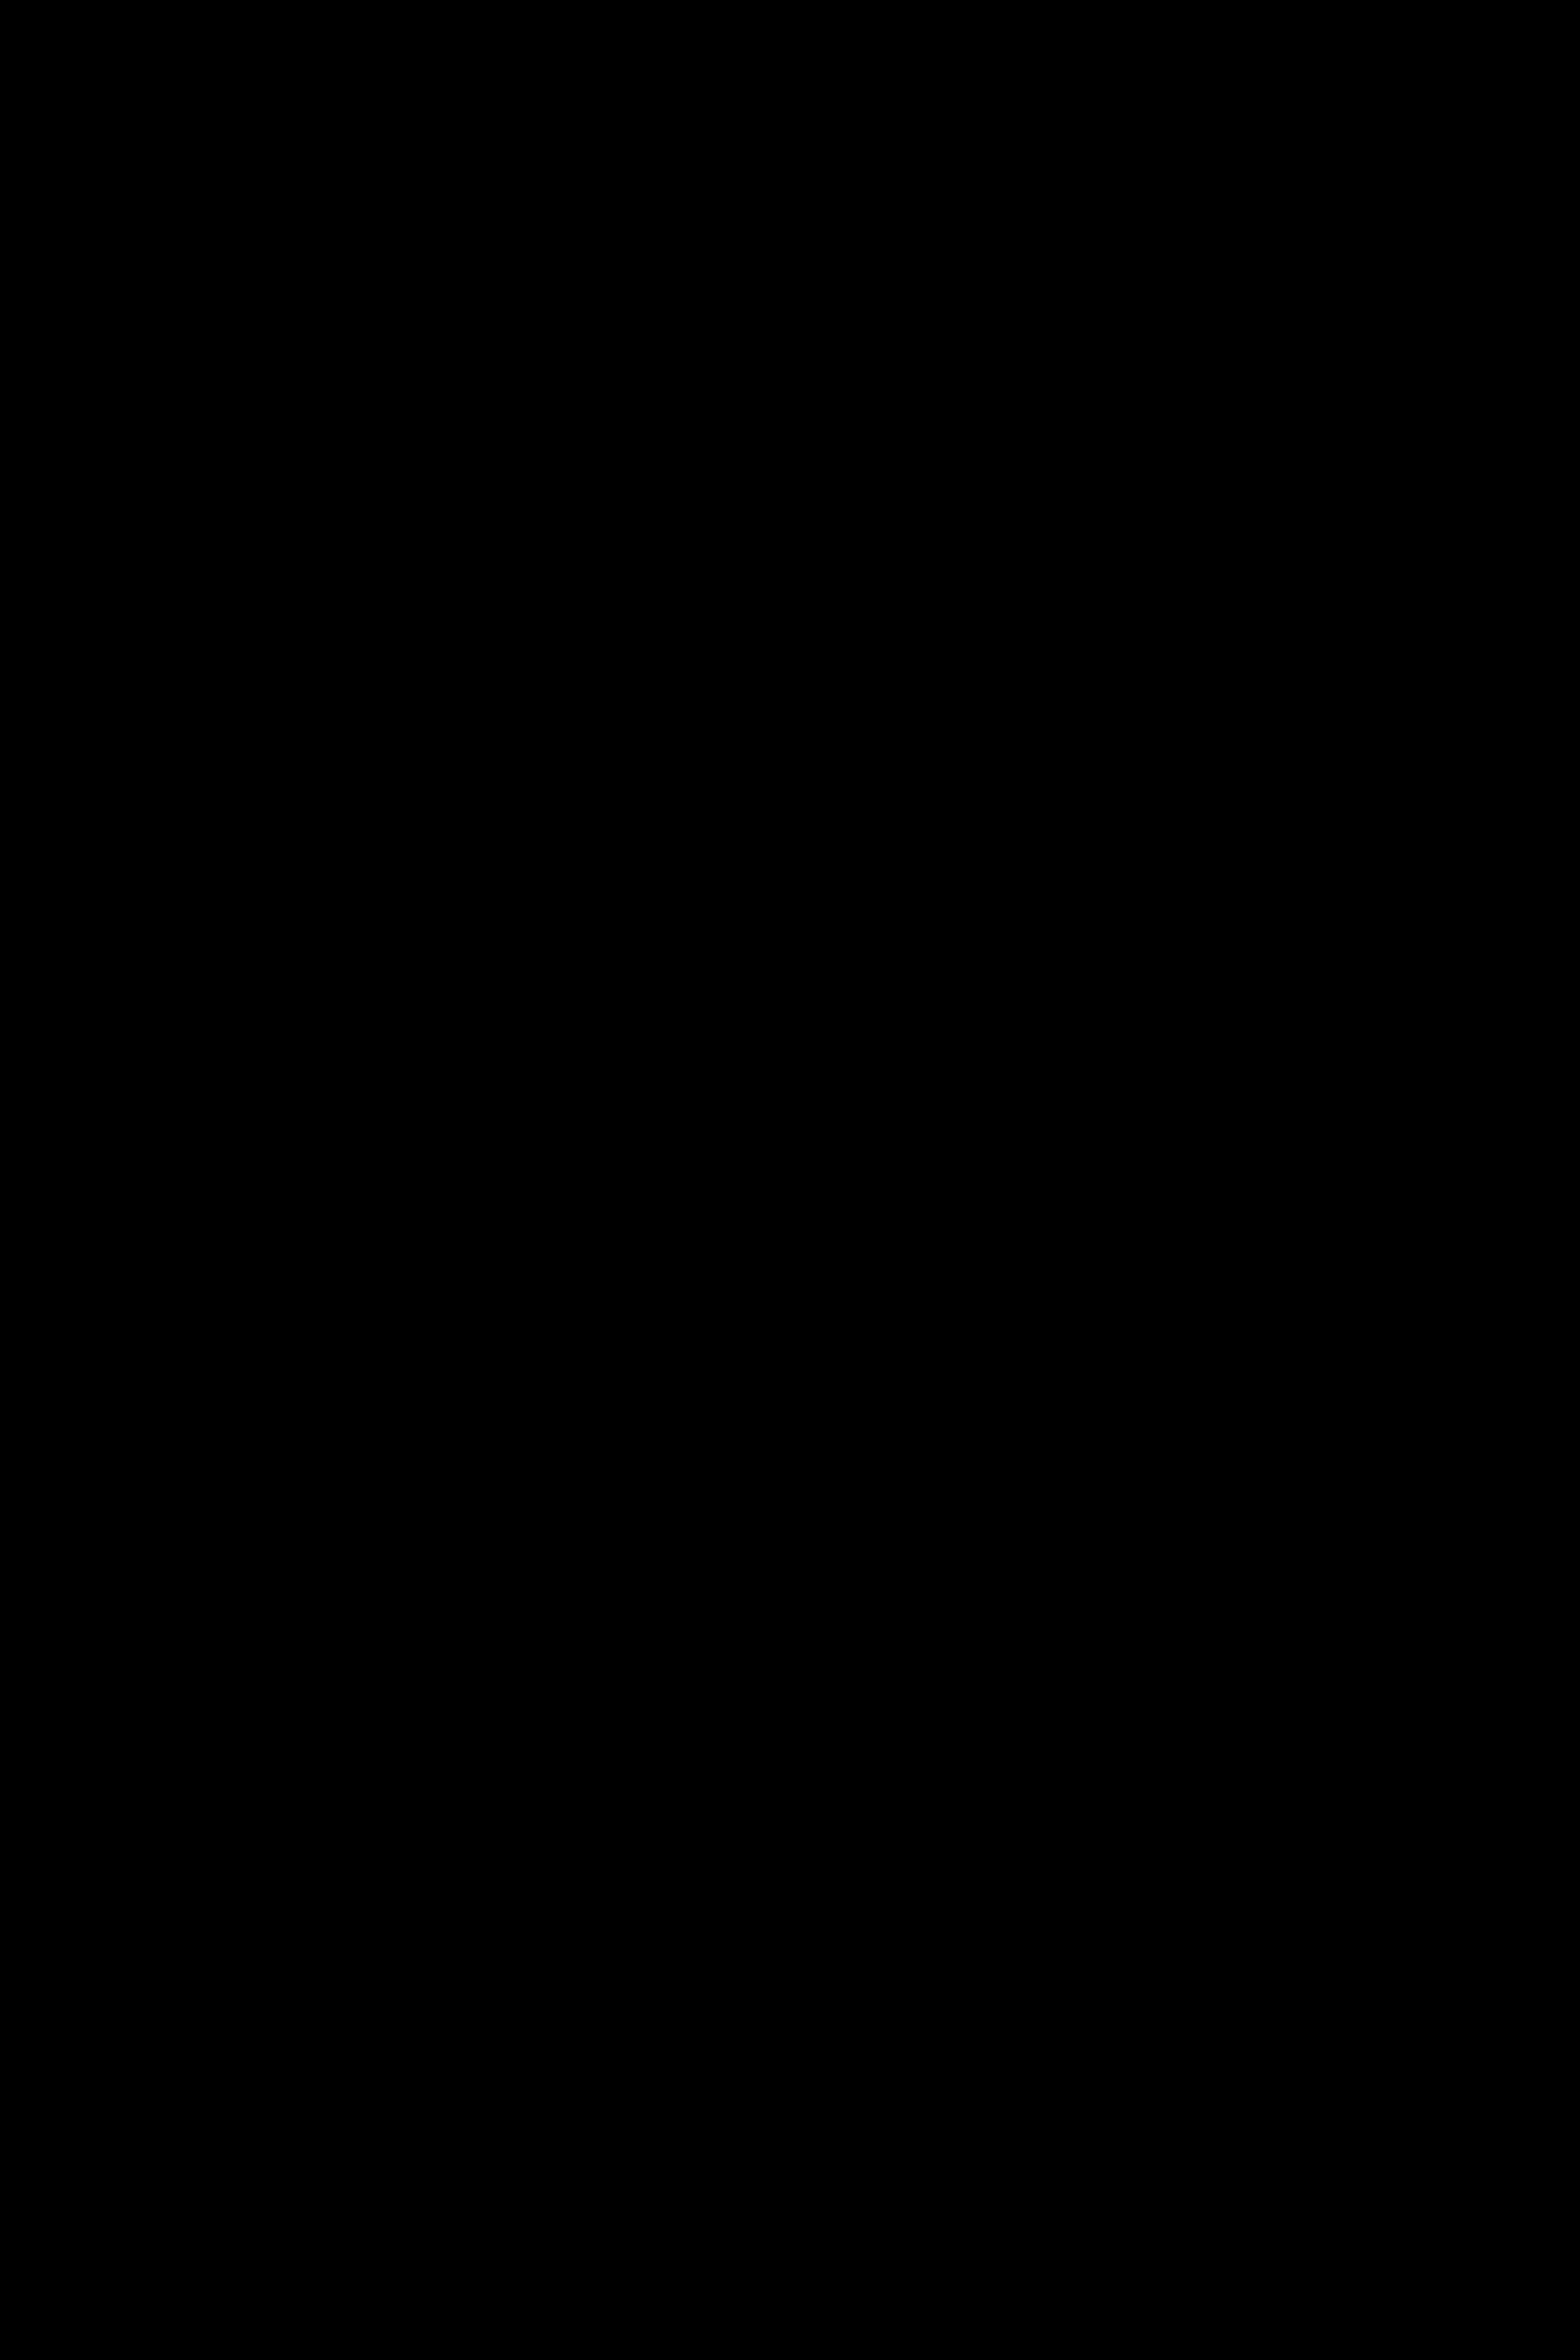 Schwarzes 20X30 300 dpi-kl.jpg